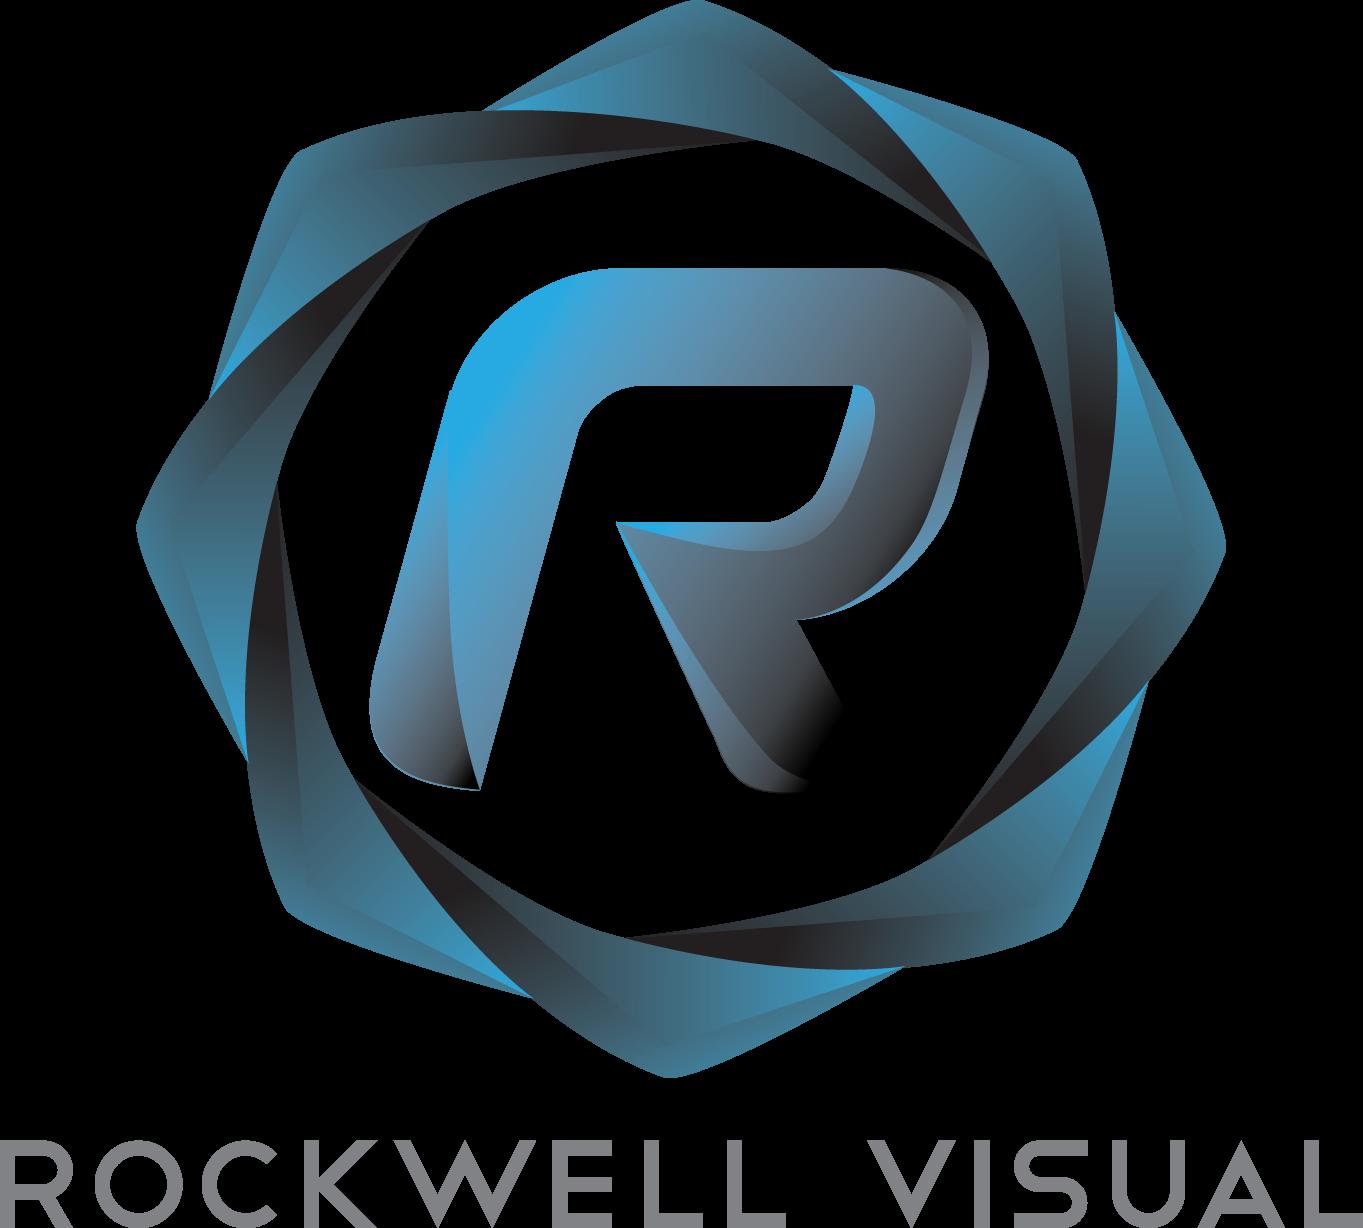 Rockwell Visual